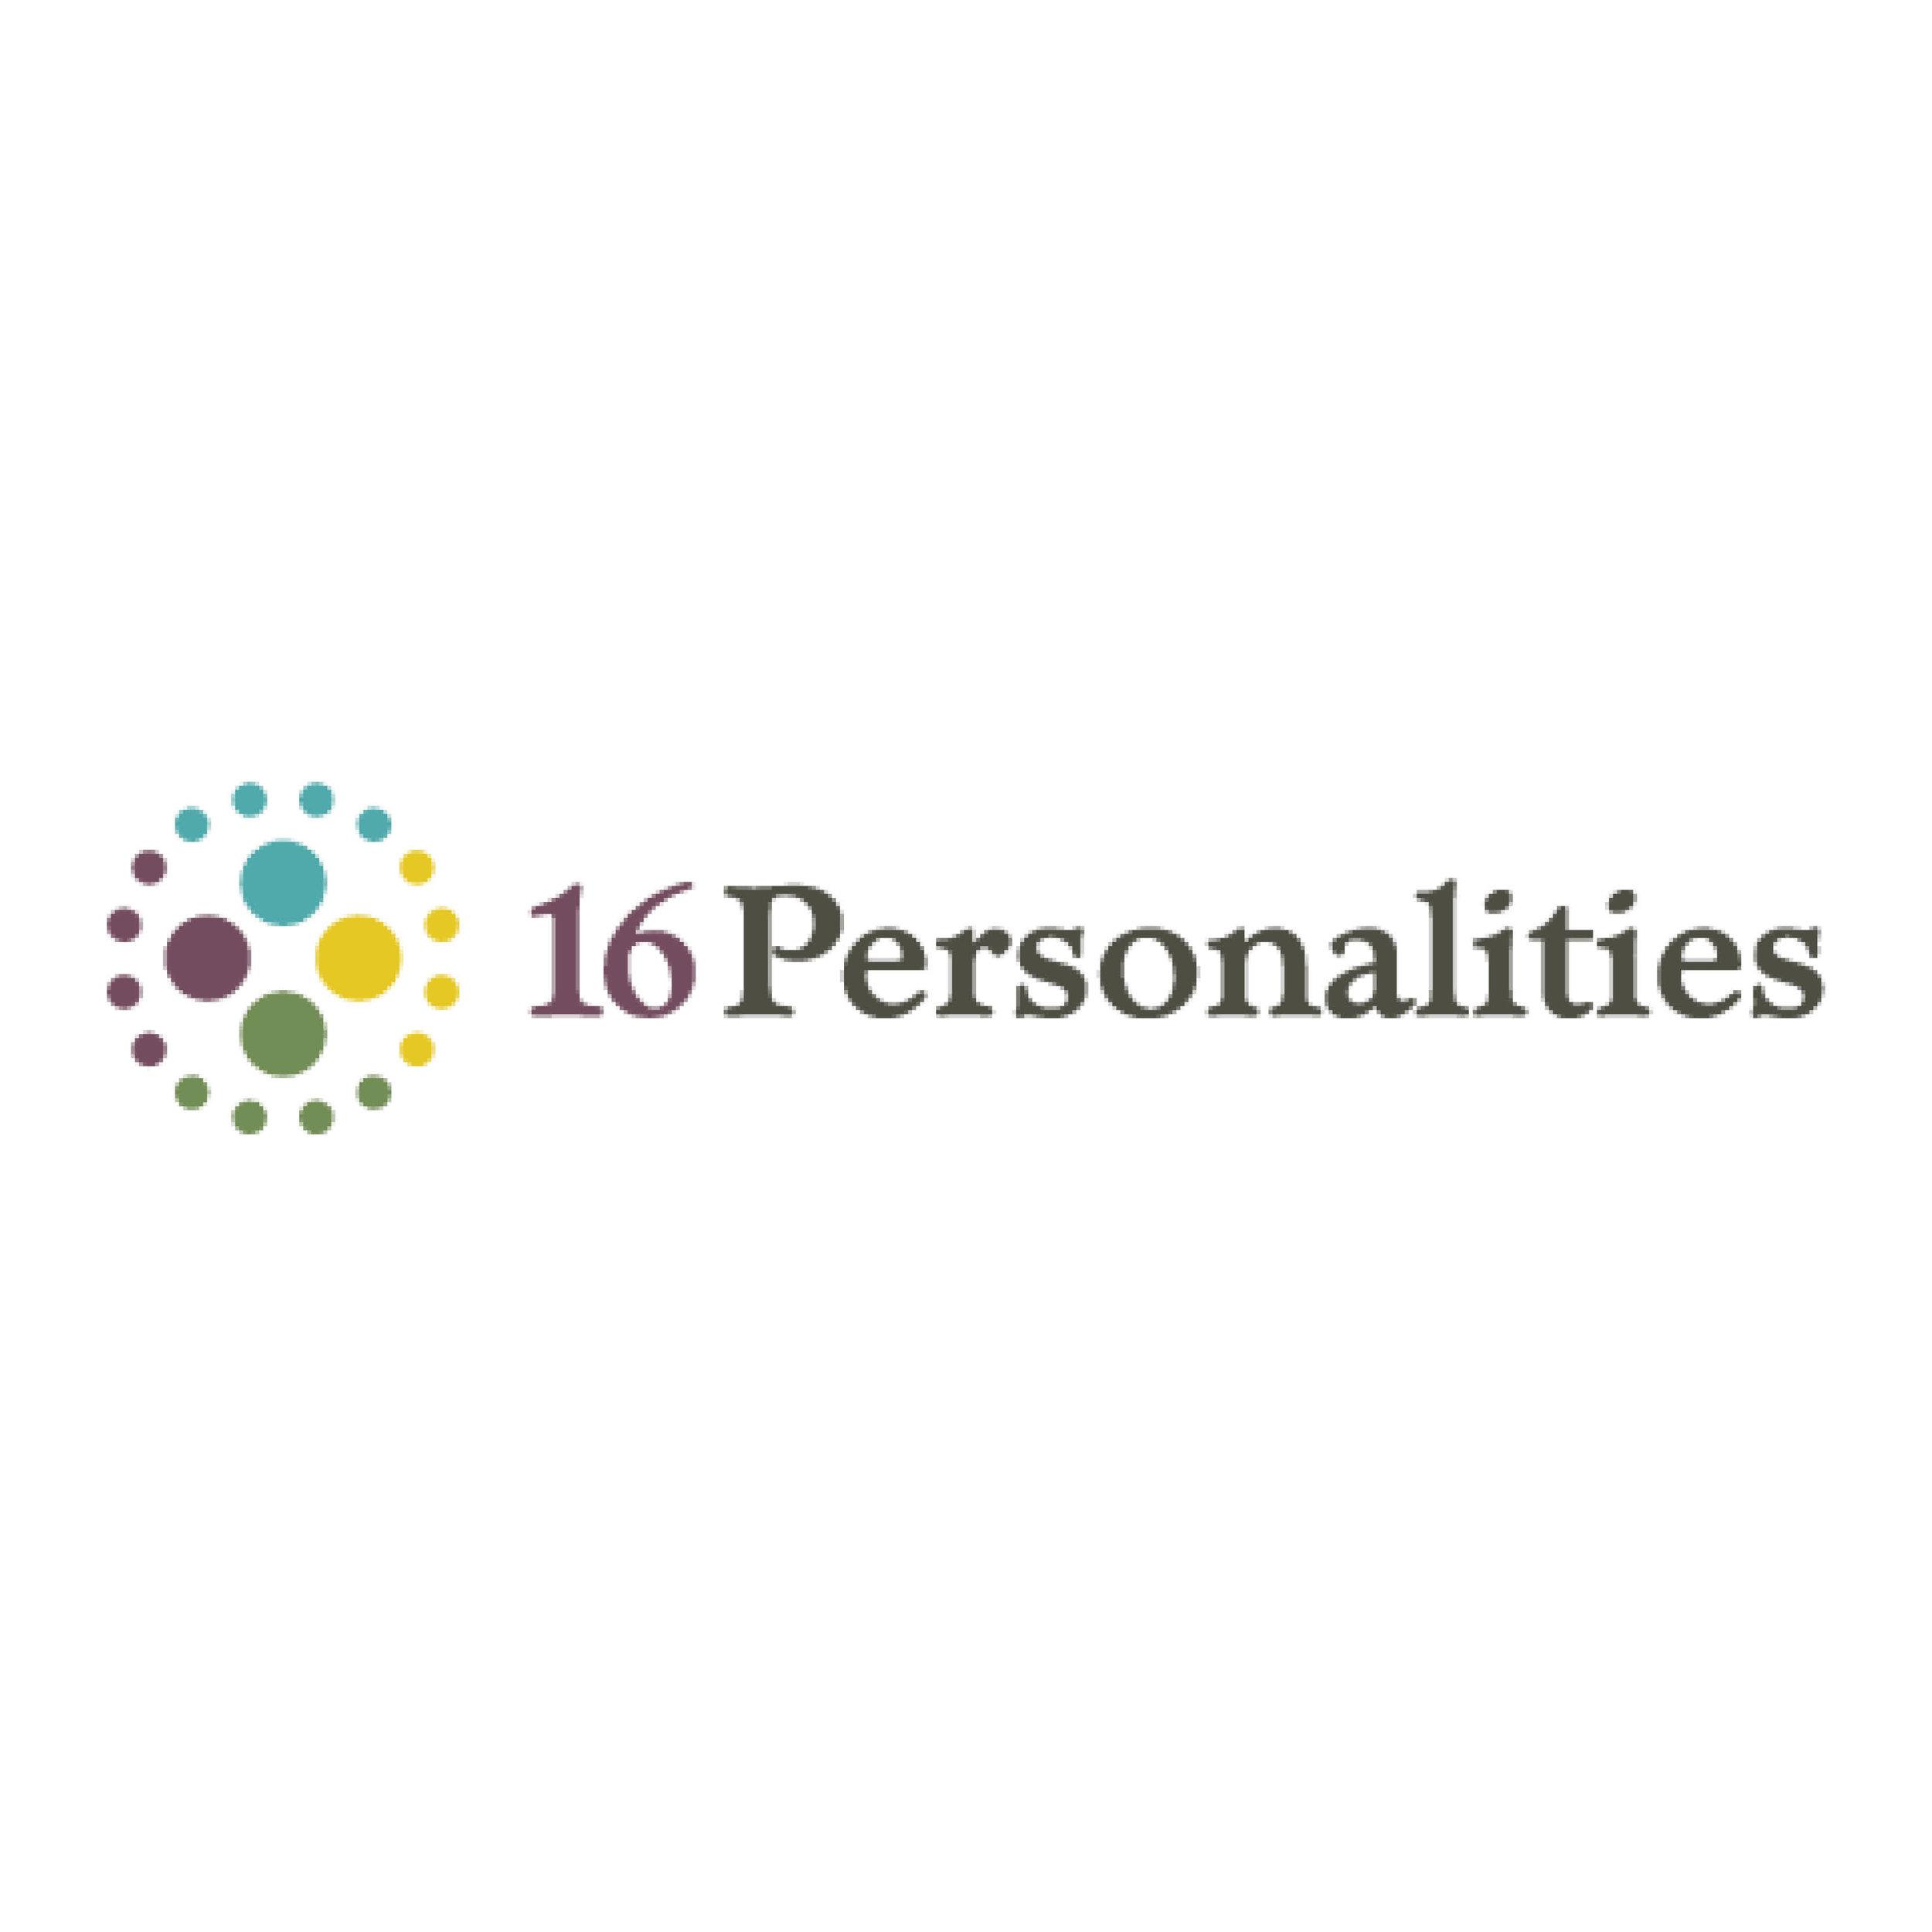 JasmineGurley.com-Personality Tests-16 Personalities.jpg